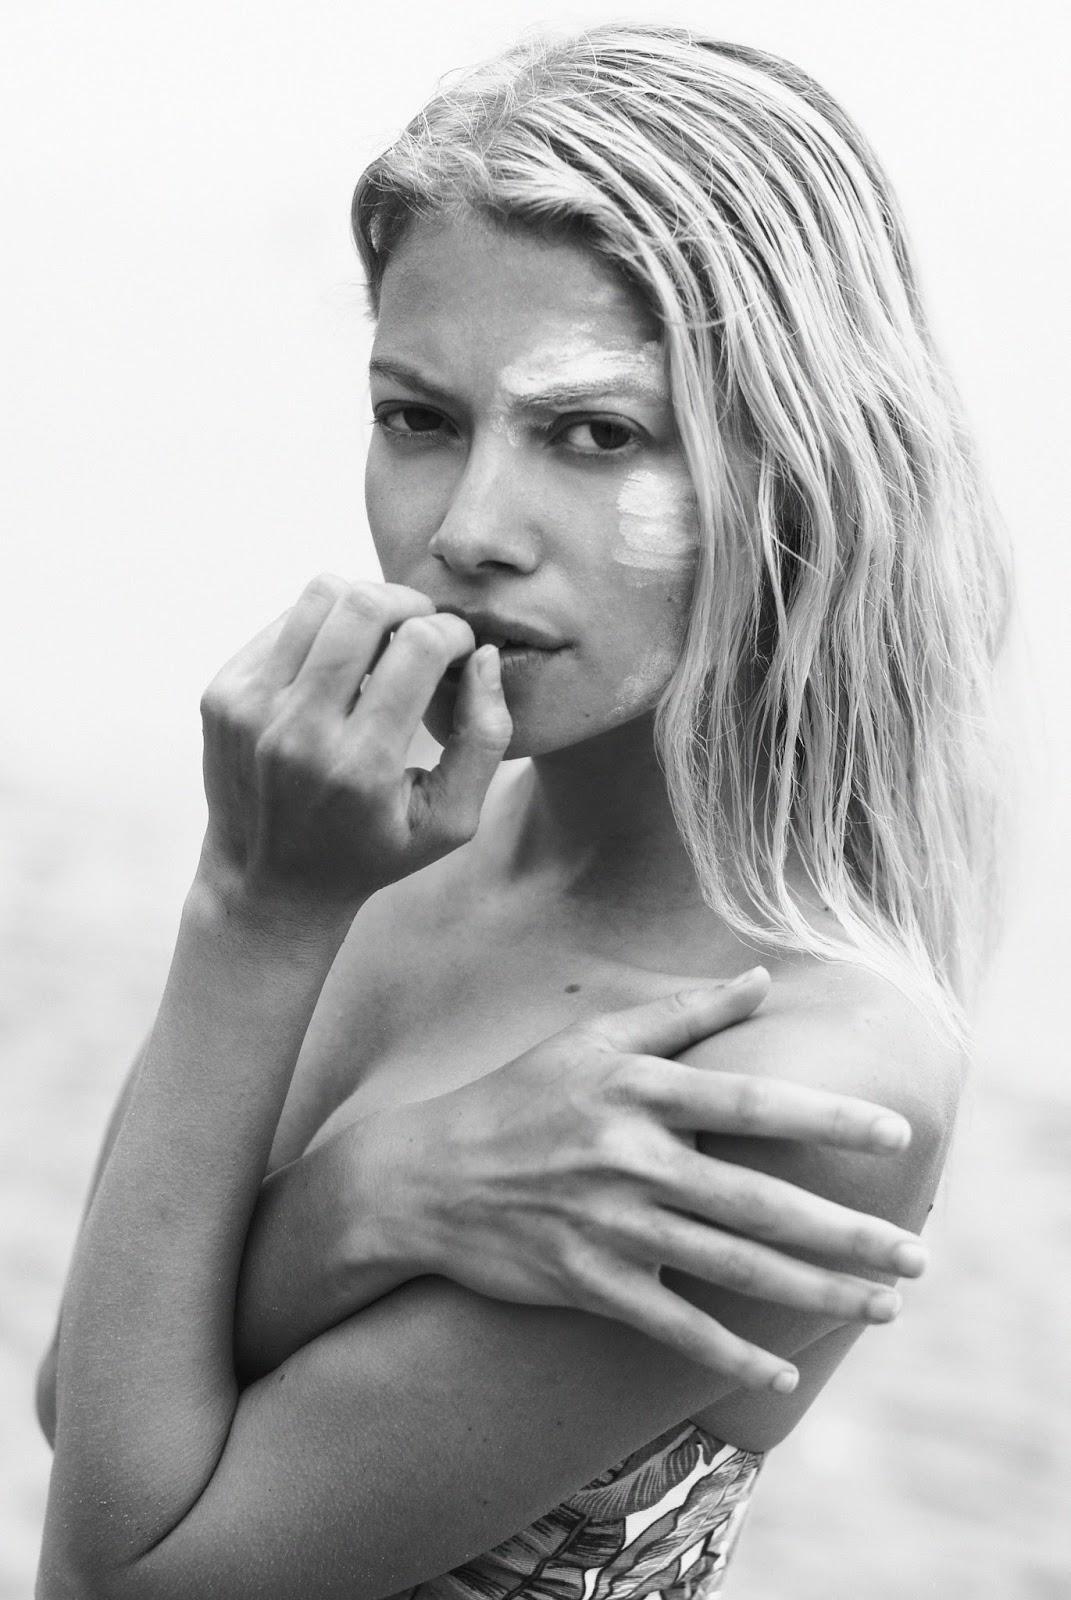 Brigitte Bourdeau